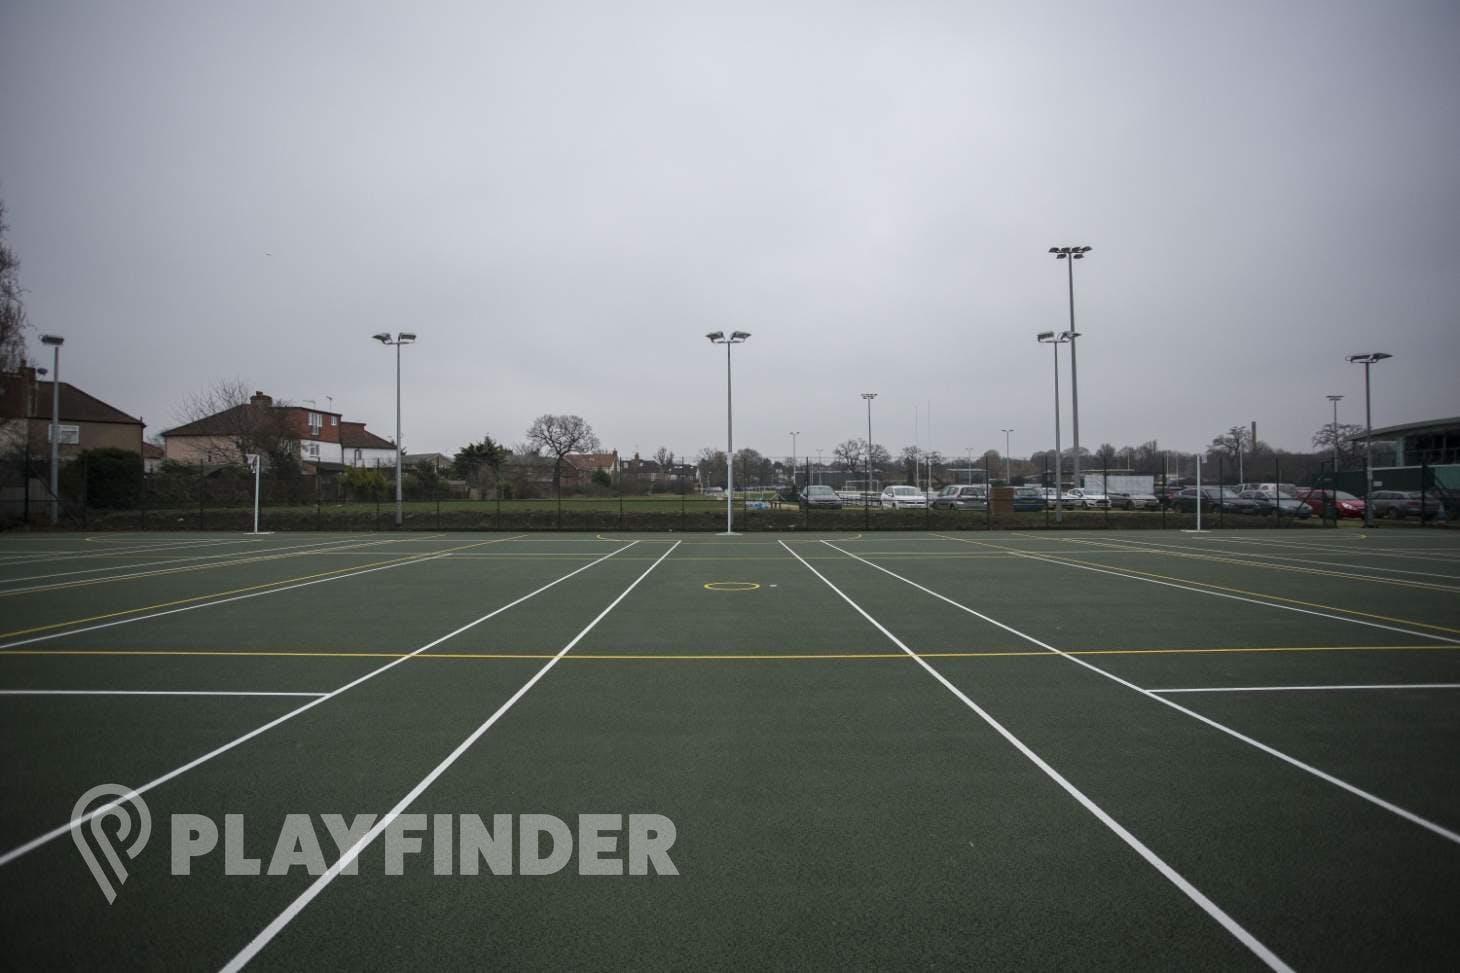 Trailfinders Sports Club Outdoor | Hard (macadam) netball court